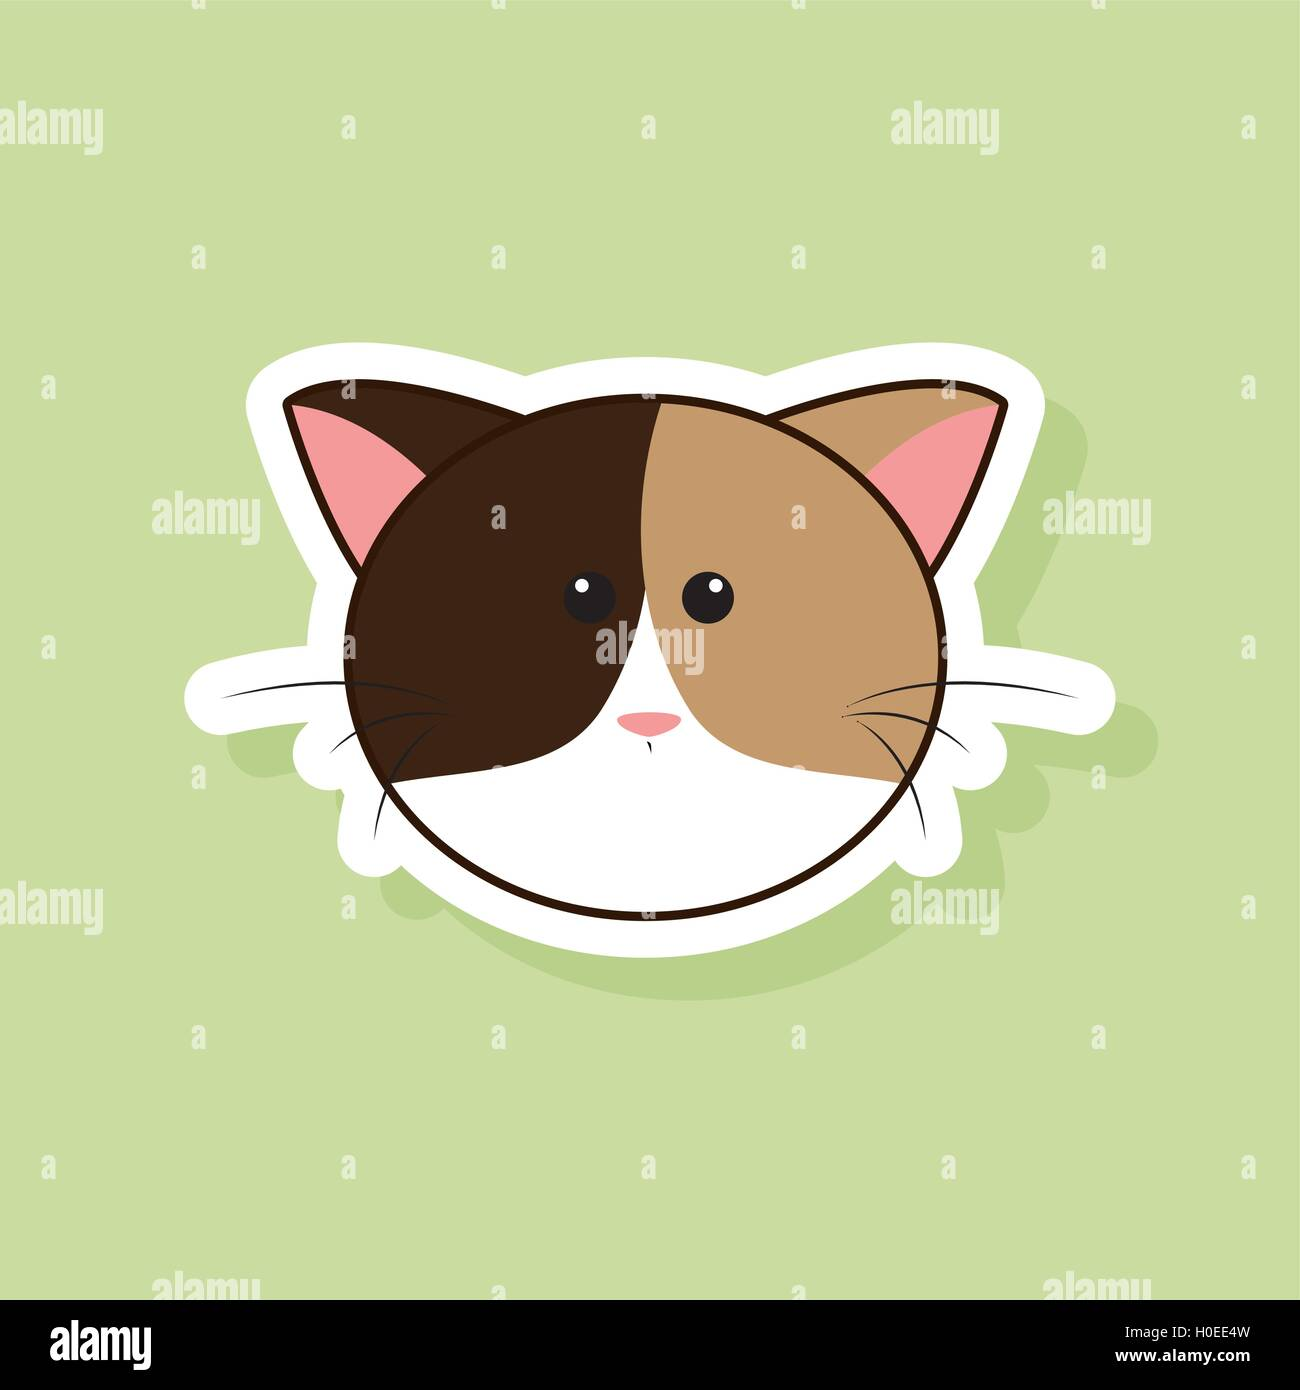 cute cat face stock vector art illustration vector image